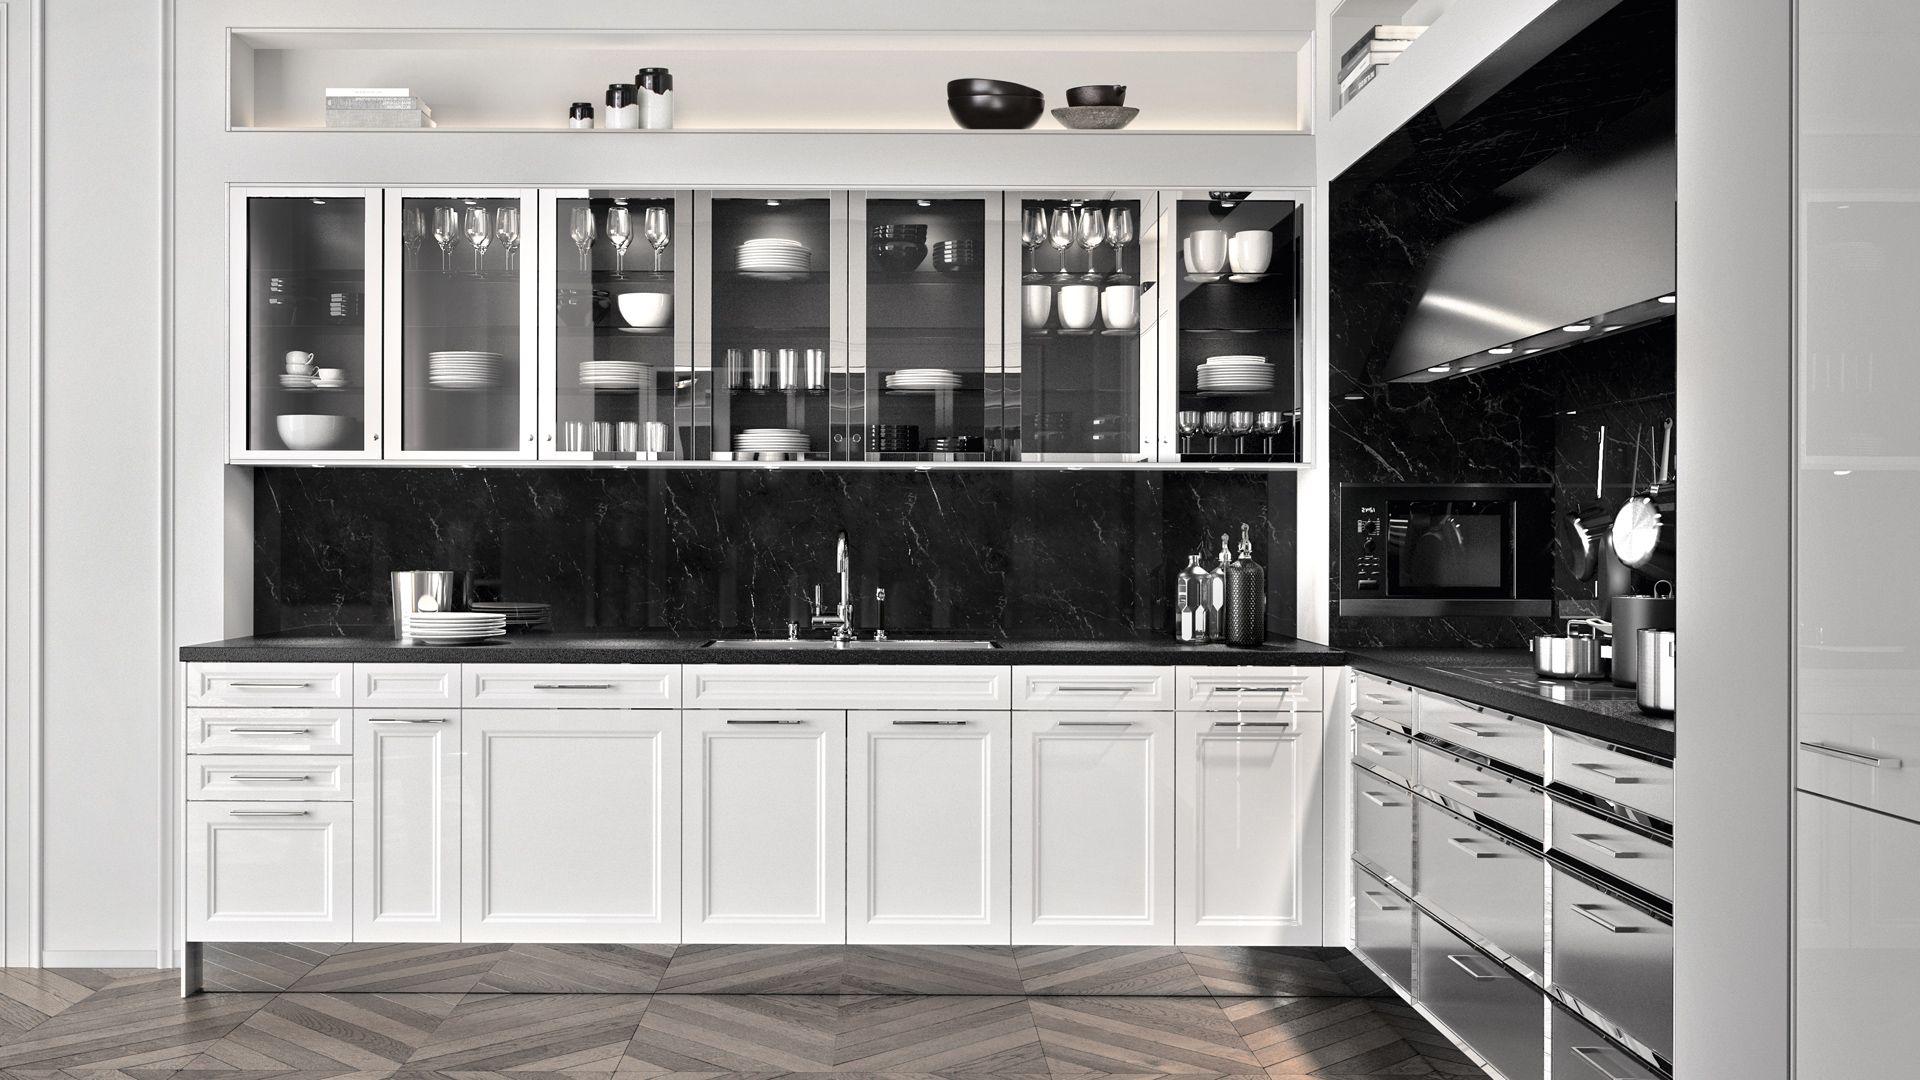 Siematic kitchens classic google search kitchen pinterest kitchen design kitchen and for Kitchen design showrooms boston